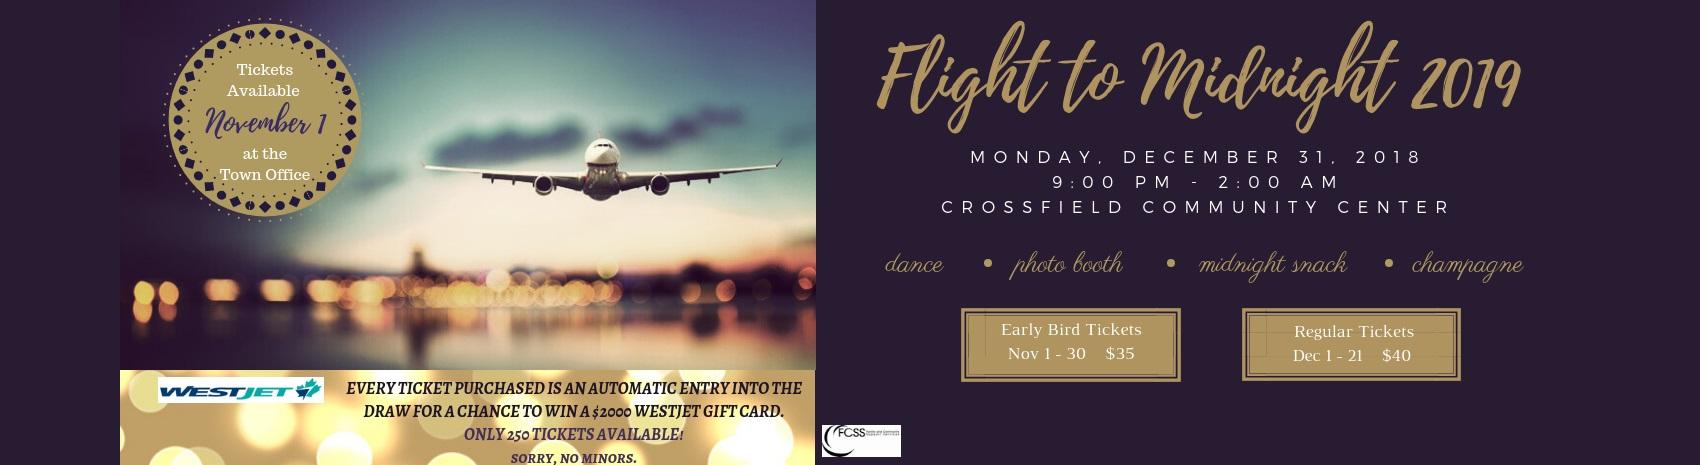 Flight to Midnight 2019